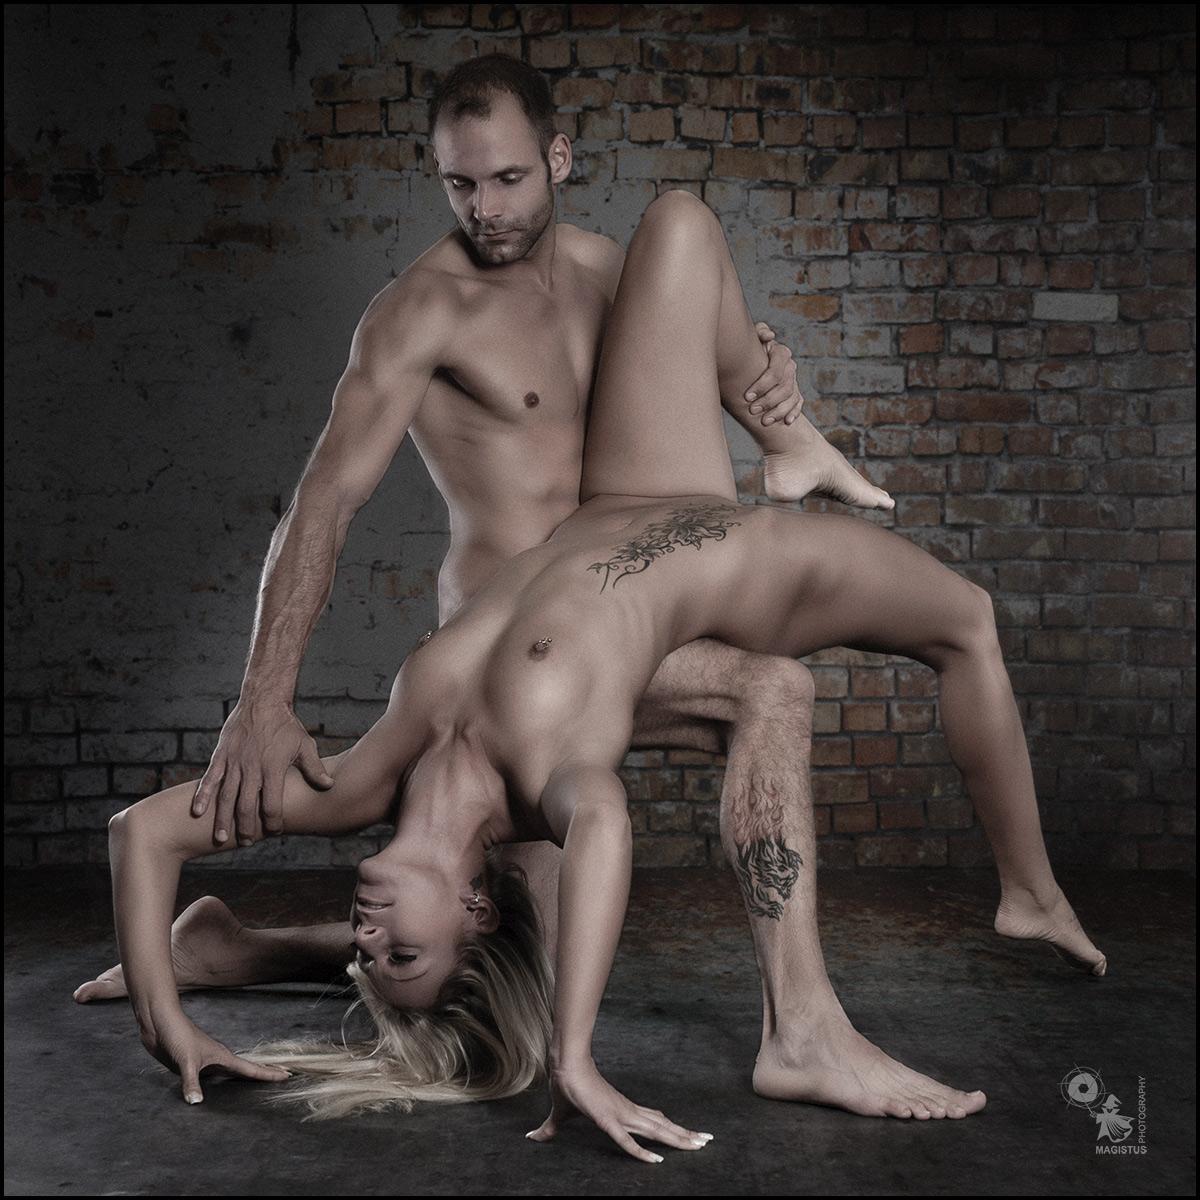 Young nudist boy shooting cum gay xxx 6